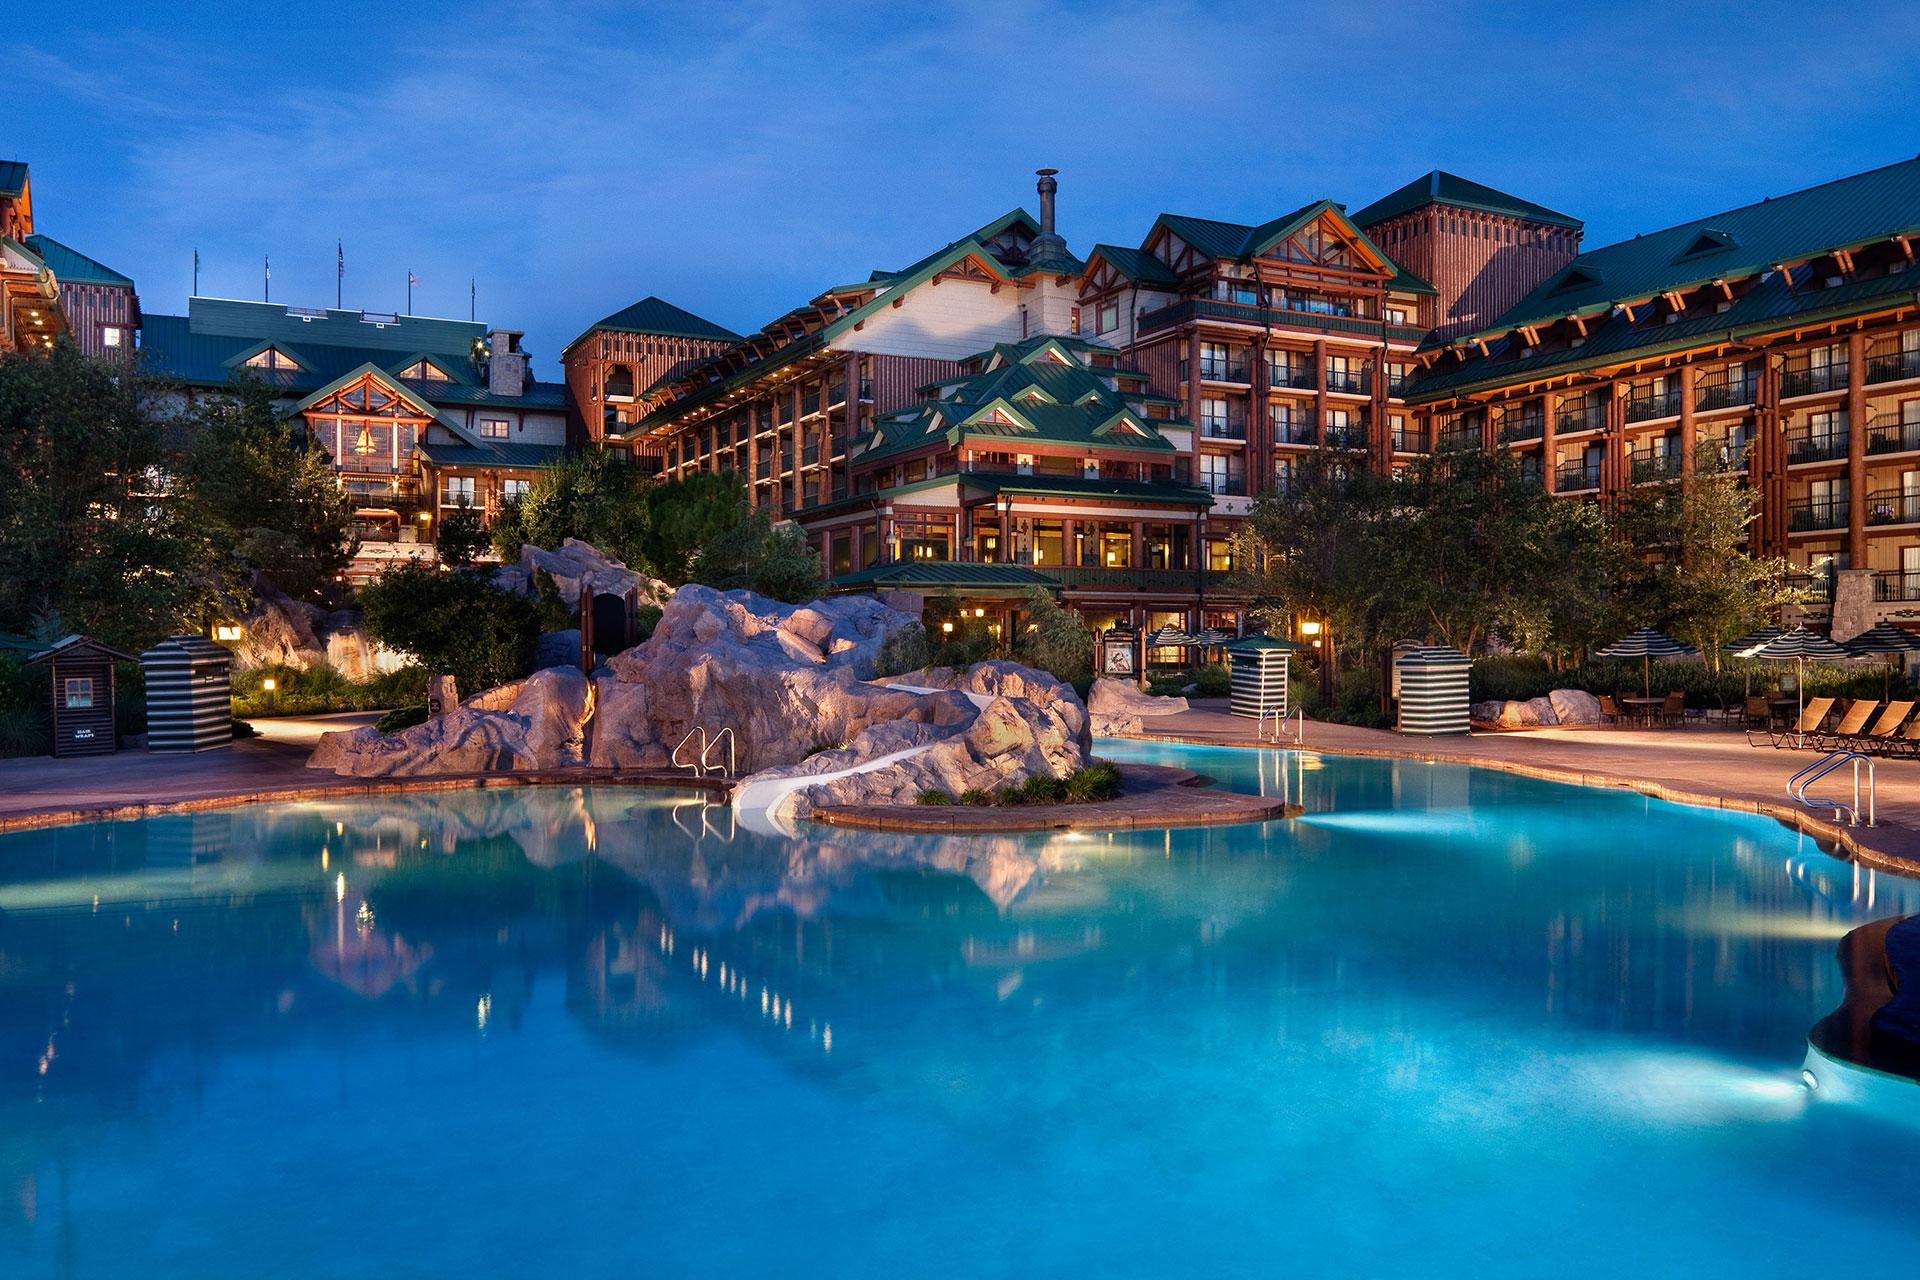 Disney's Wilderness Lodge; Courtesy of Disney